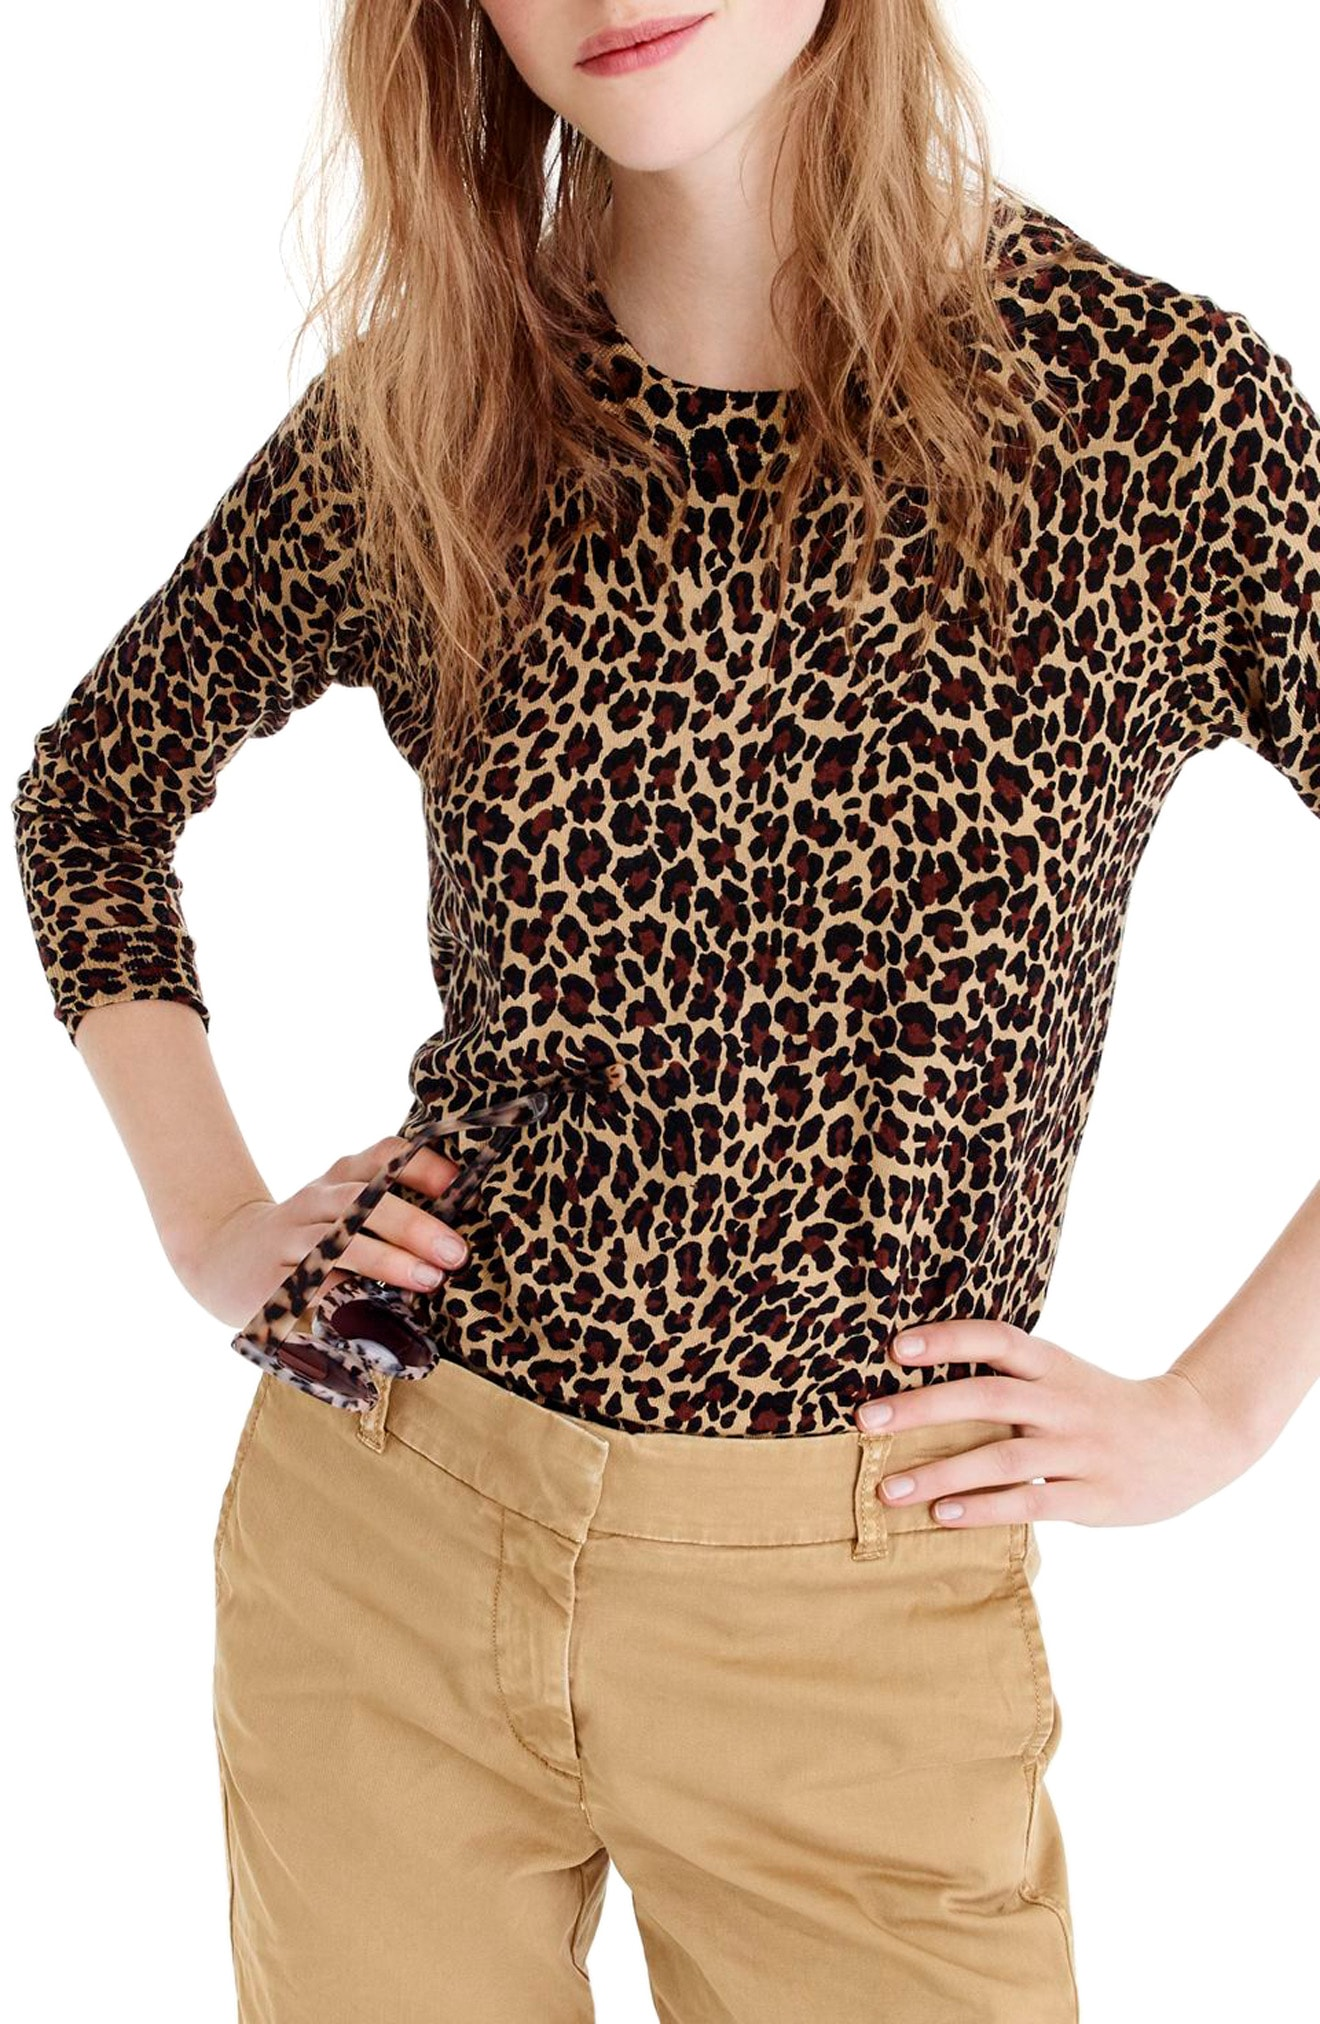 J.Crew Tippi Leopard Print Sweater (Regular & Plus Size)